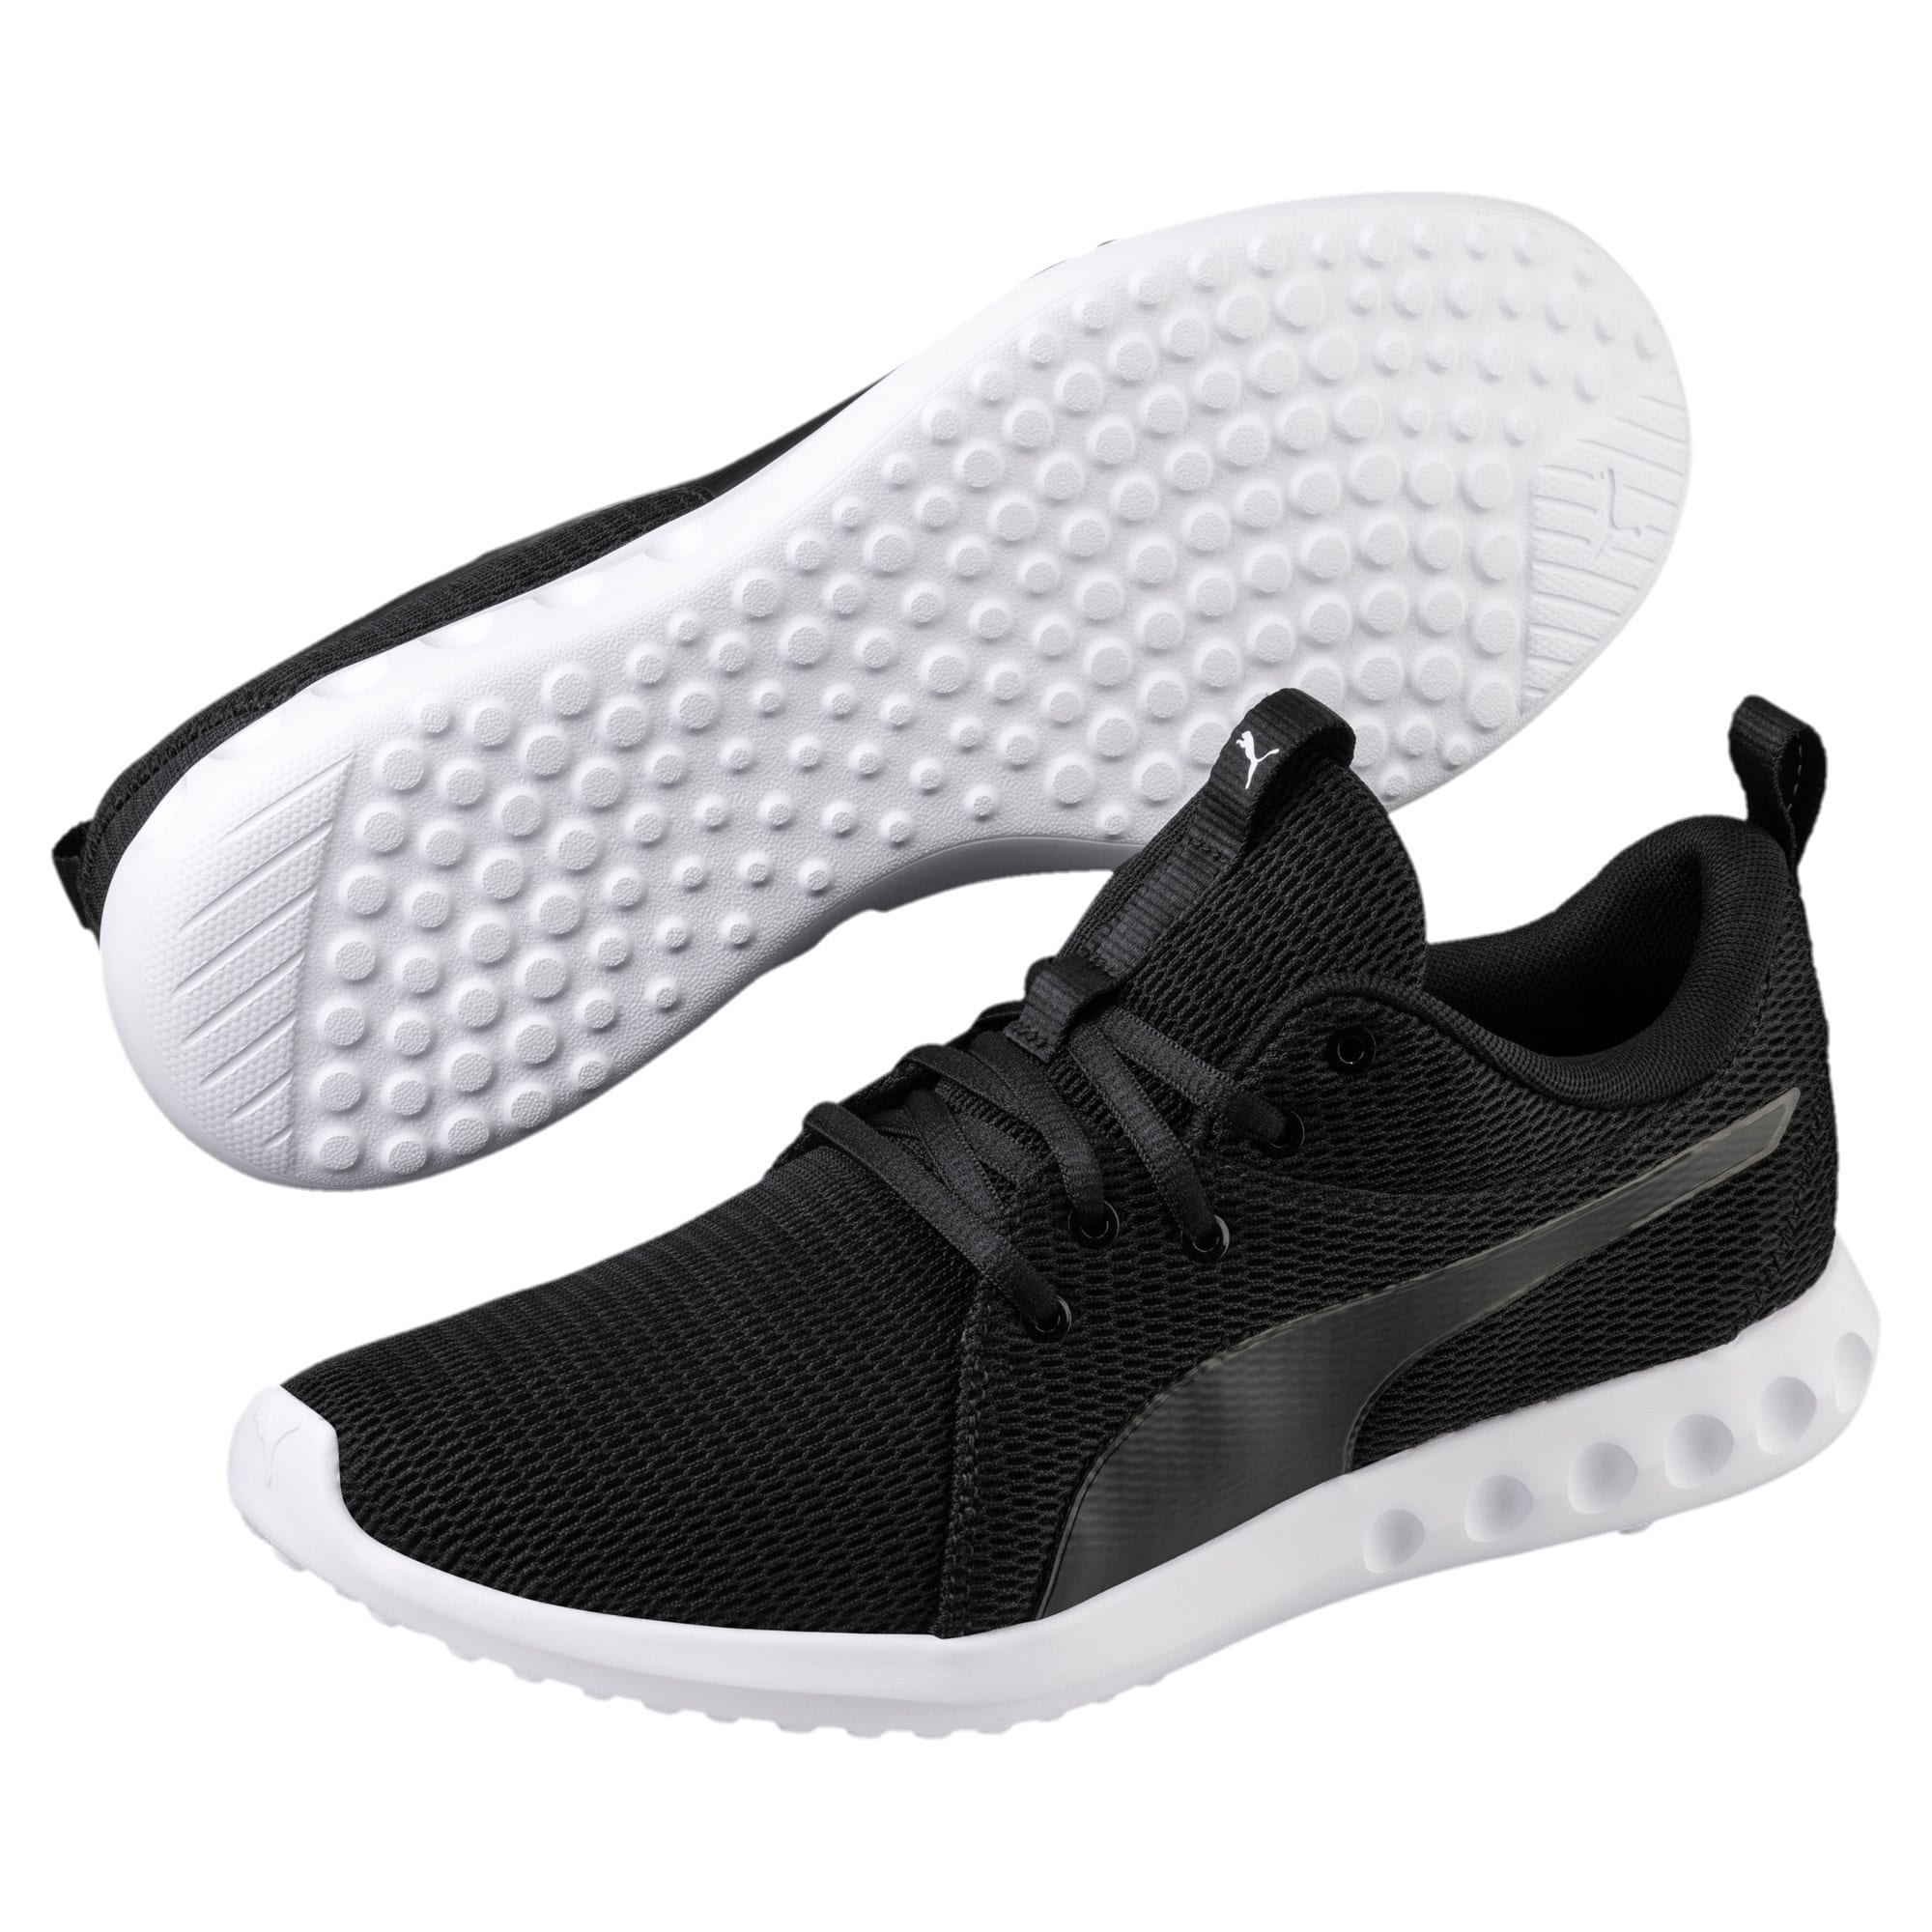 Thumbnail 2 of Carson 2 New Core Men's Running Shoes, Puma Black-Puma White, medium